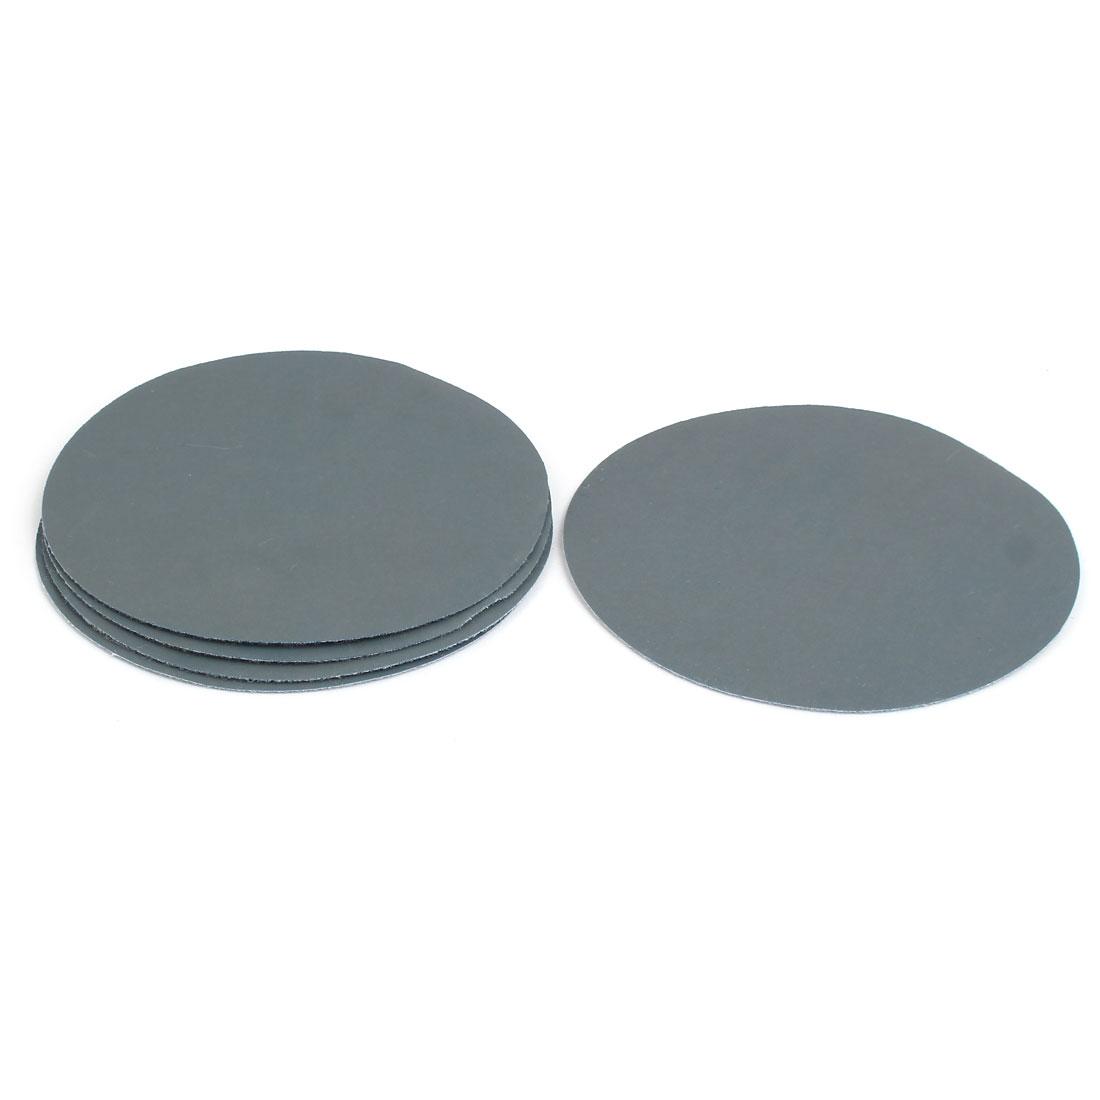 "Unique Bargains 3000 Grit 5"" Diameter Sandpaper Hook Loop Sanding Disc 5 Pcs - image 3 of 3"